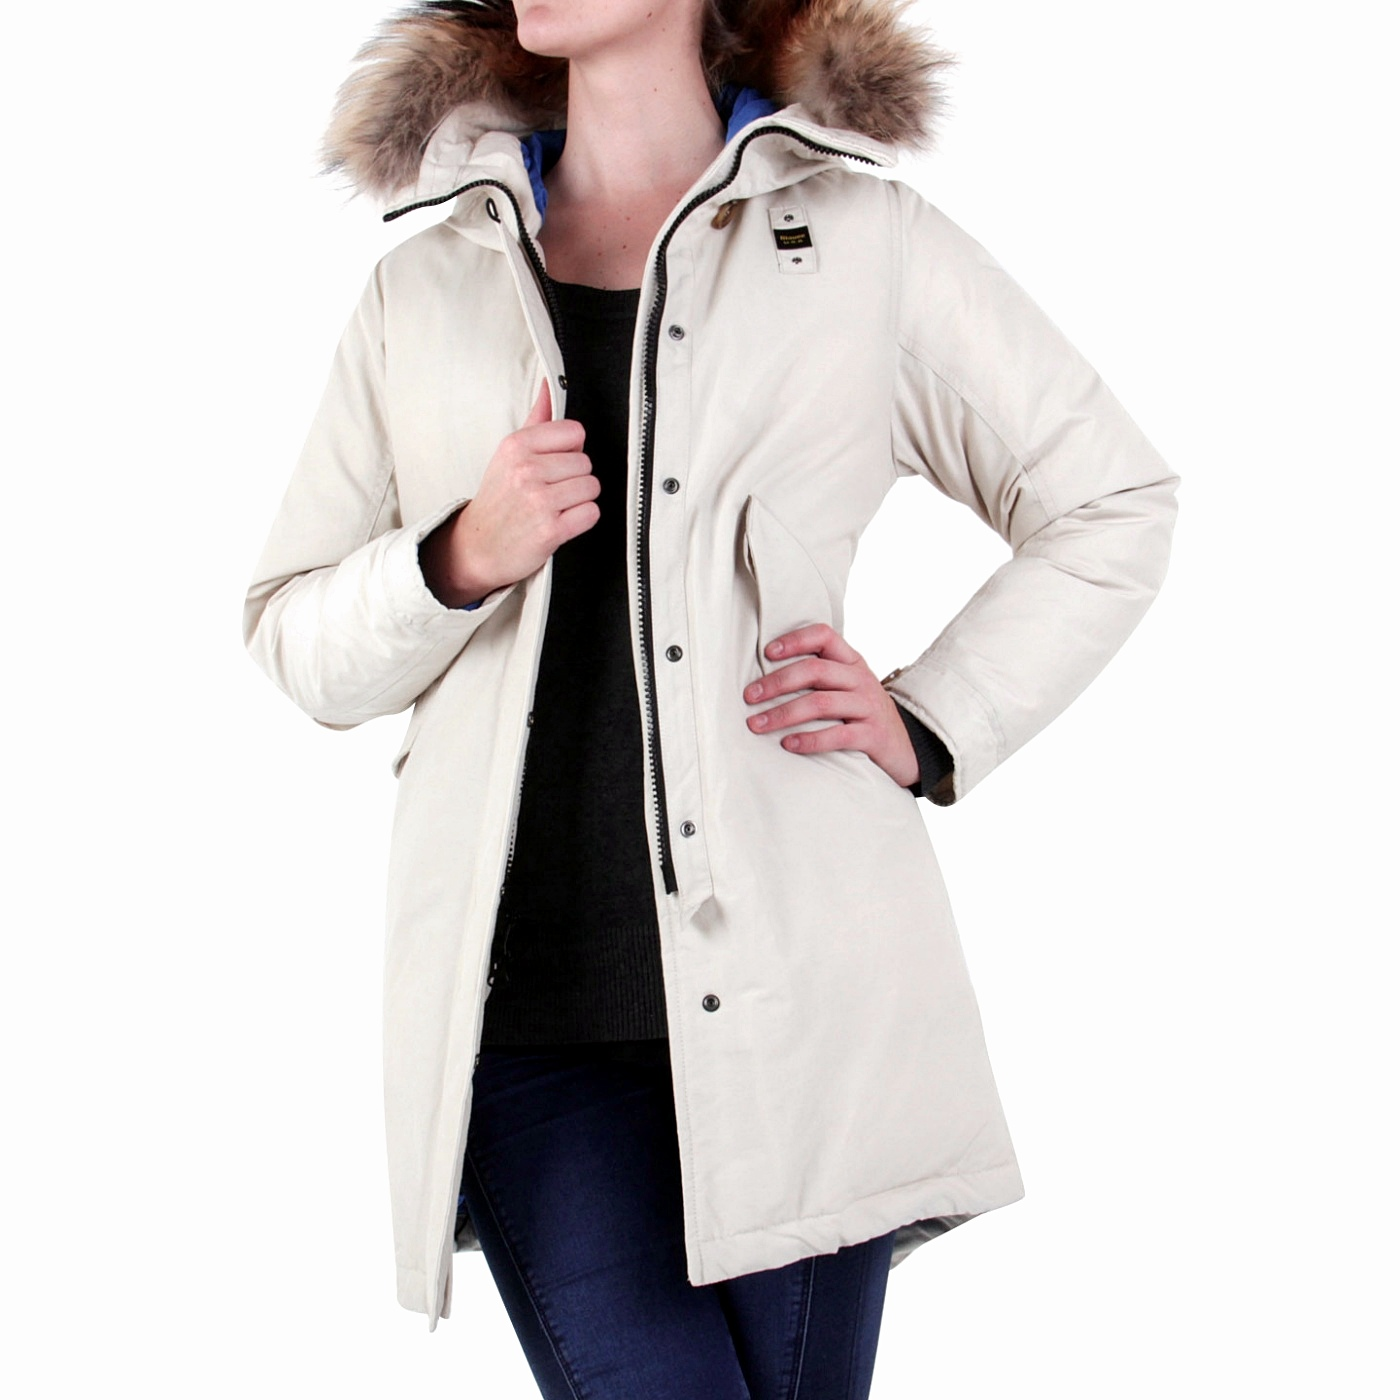 blauer usa damen winter daunen parka mantel jacke limited beige bld03045 ebay. Black Bedroom Furniture Sets. Home Design Ideas